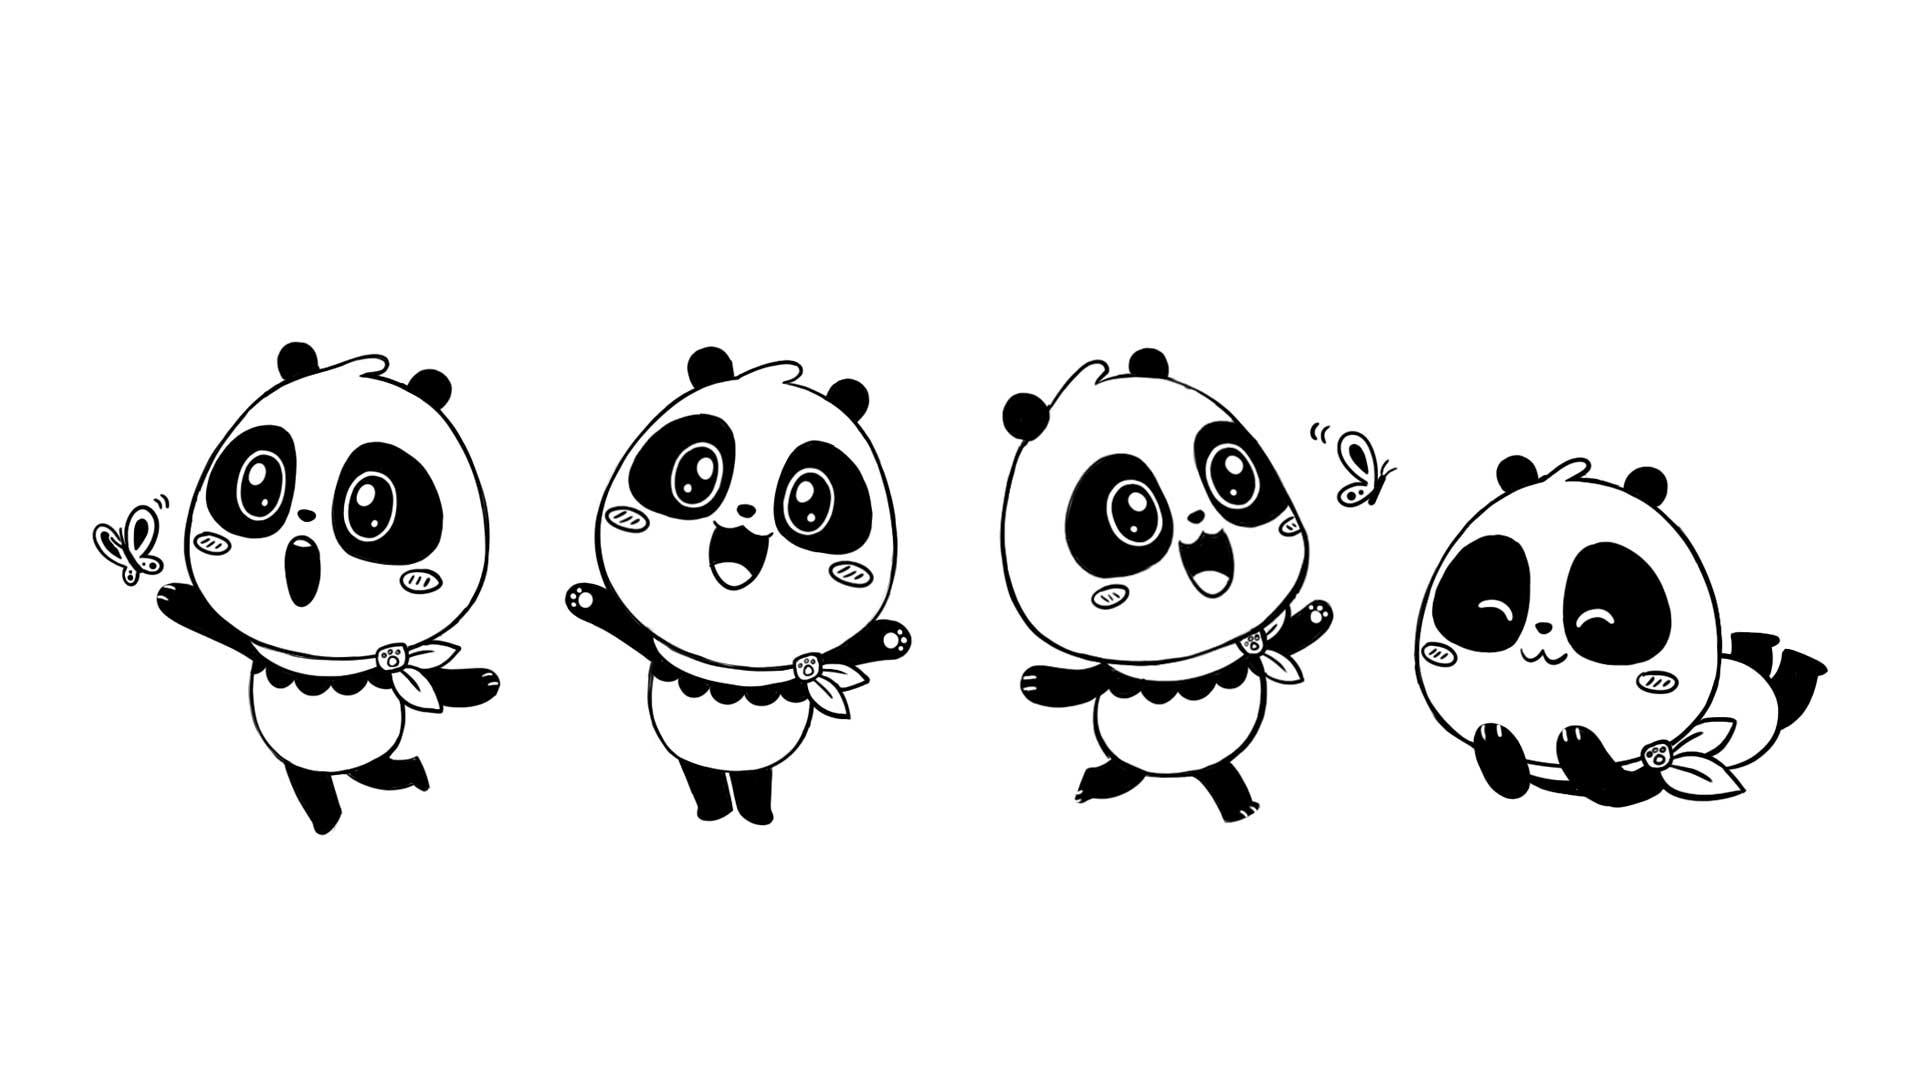 3D-Animation-PandaHouse-Hologram-3